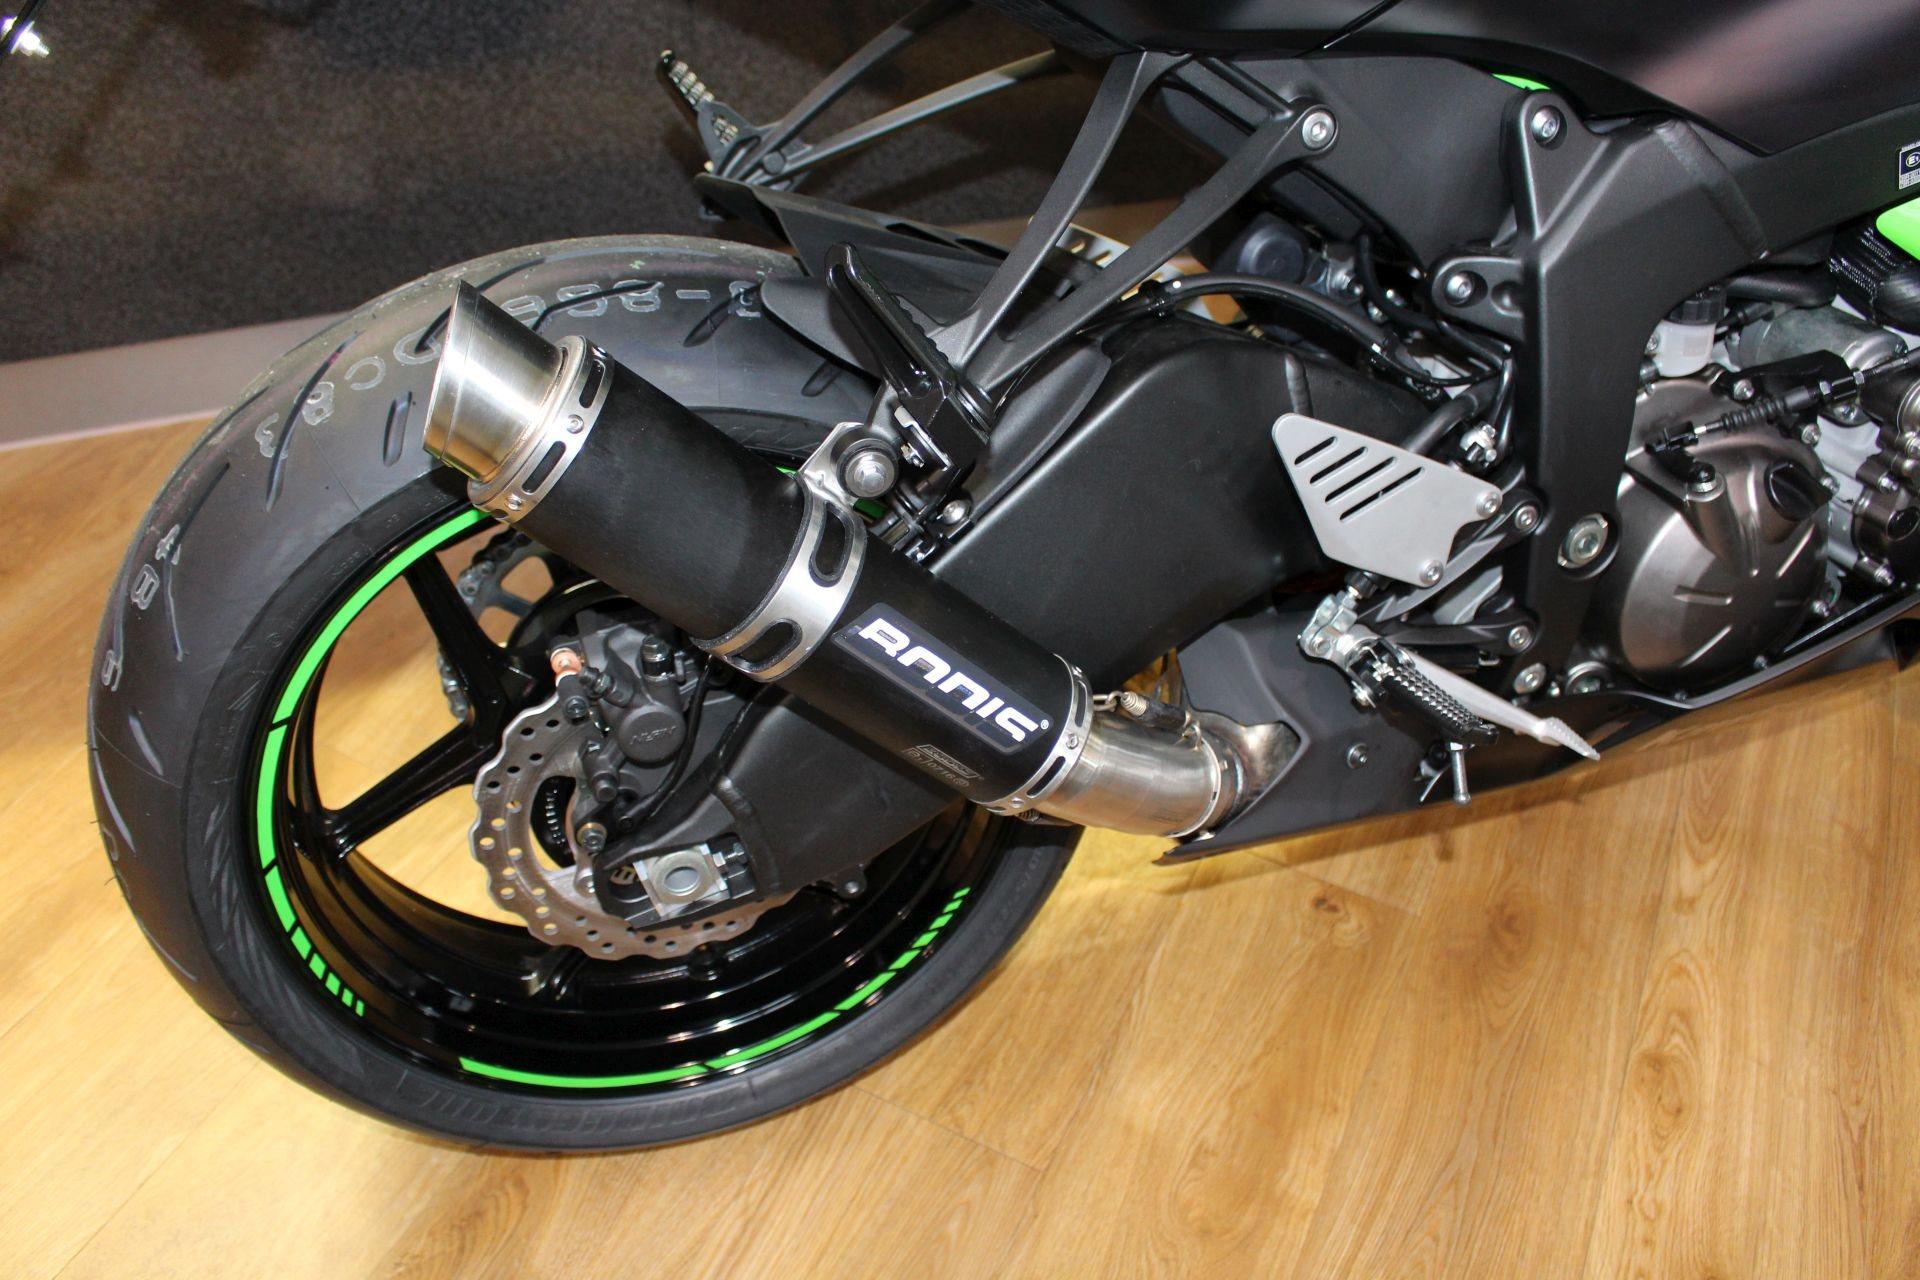 Umgebautes Motorrad Kawasaki Ninja ZX 6R 636 Von Zweiradtechnik Zepf GmbH